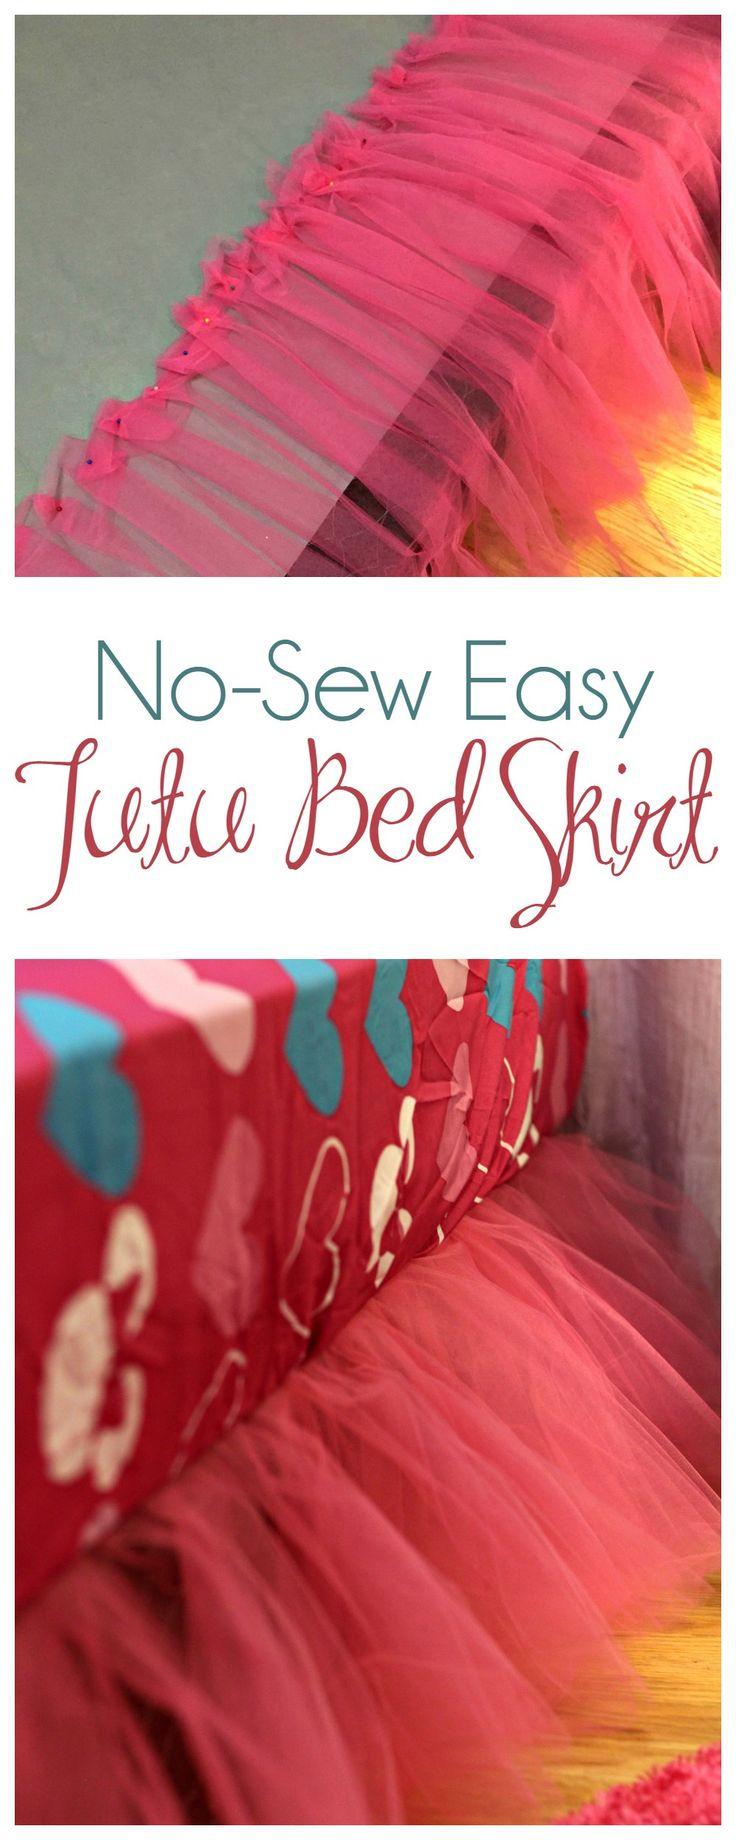 No-Sew Tutu Bed Skirt 9